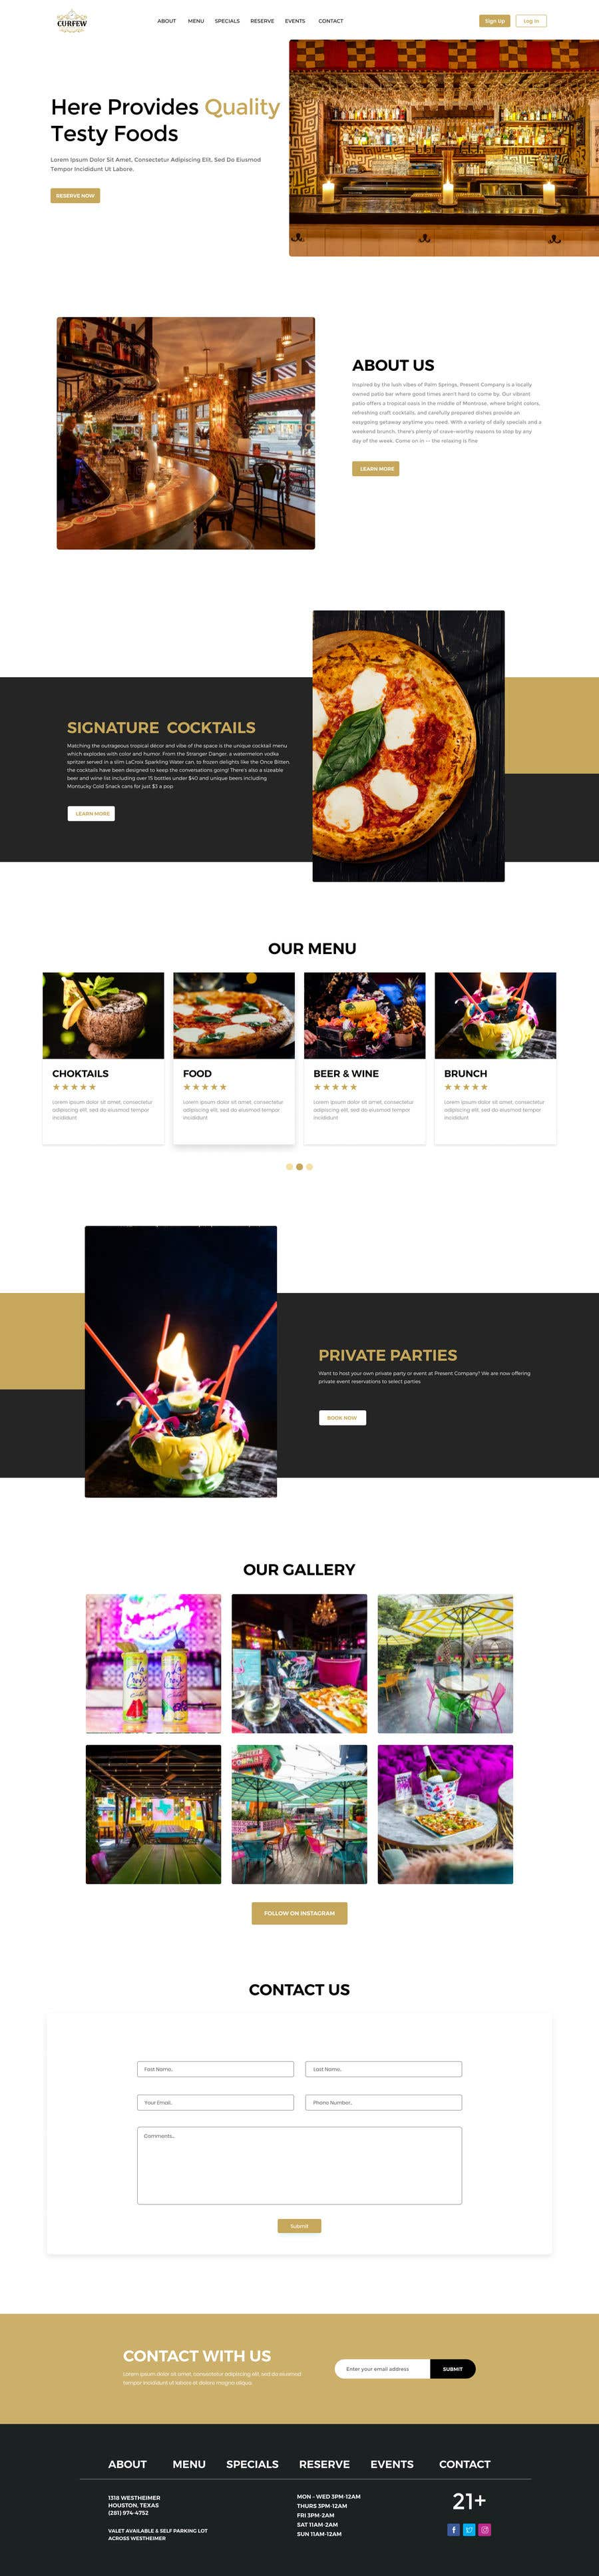 Contest Entry #                                        155                                      for                                         Design FUN Website for Speakeasy Concept